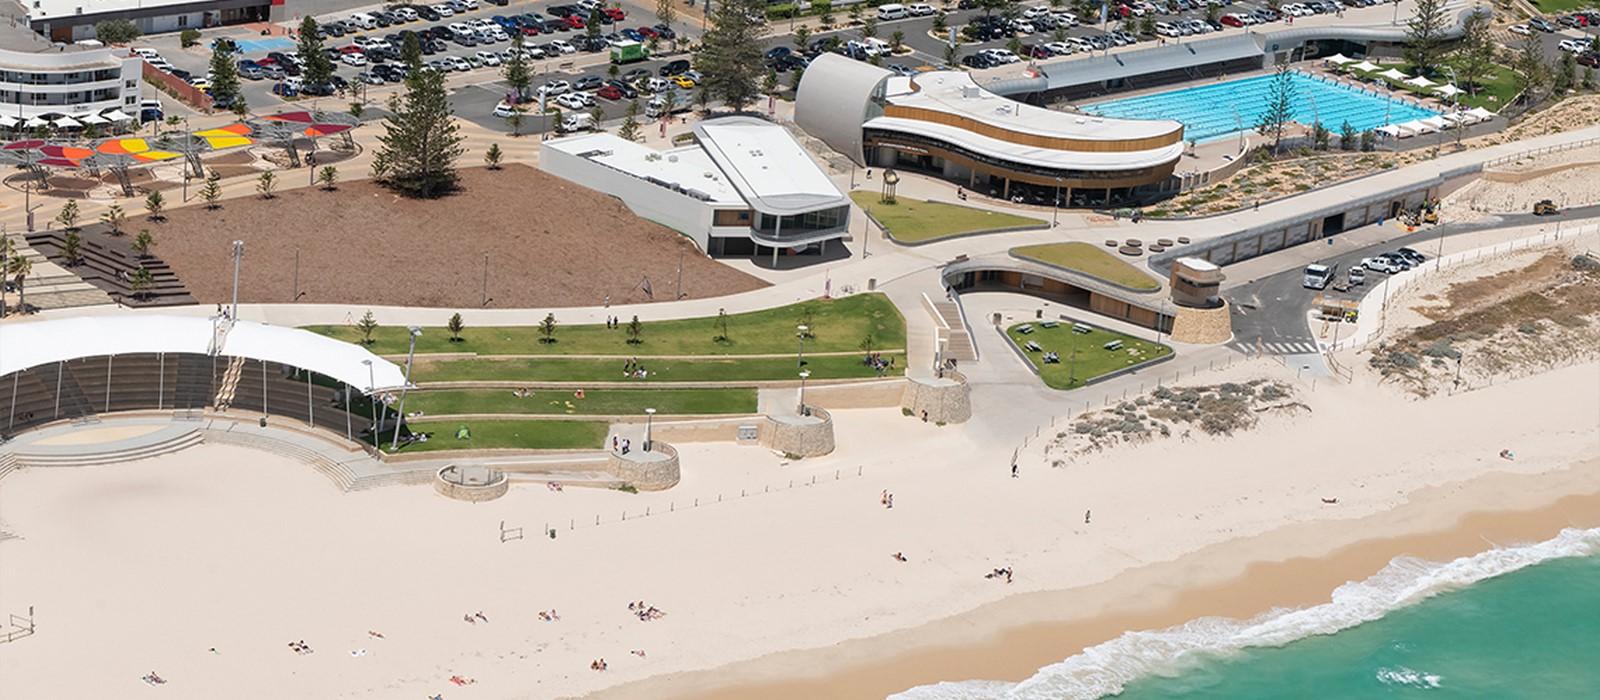 Scarborough Beach Services & Surf Club, Scarborough Beach, Western Australia - Sheet1